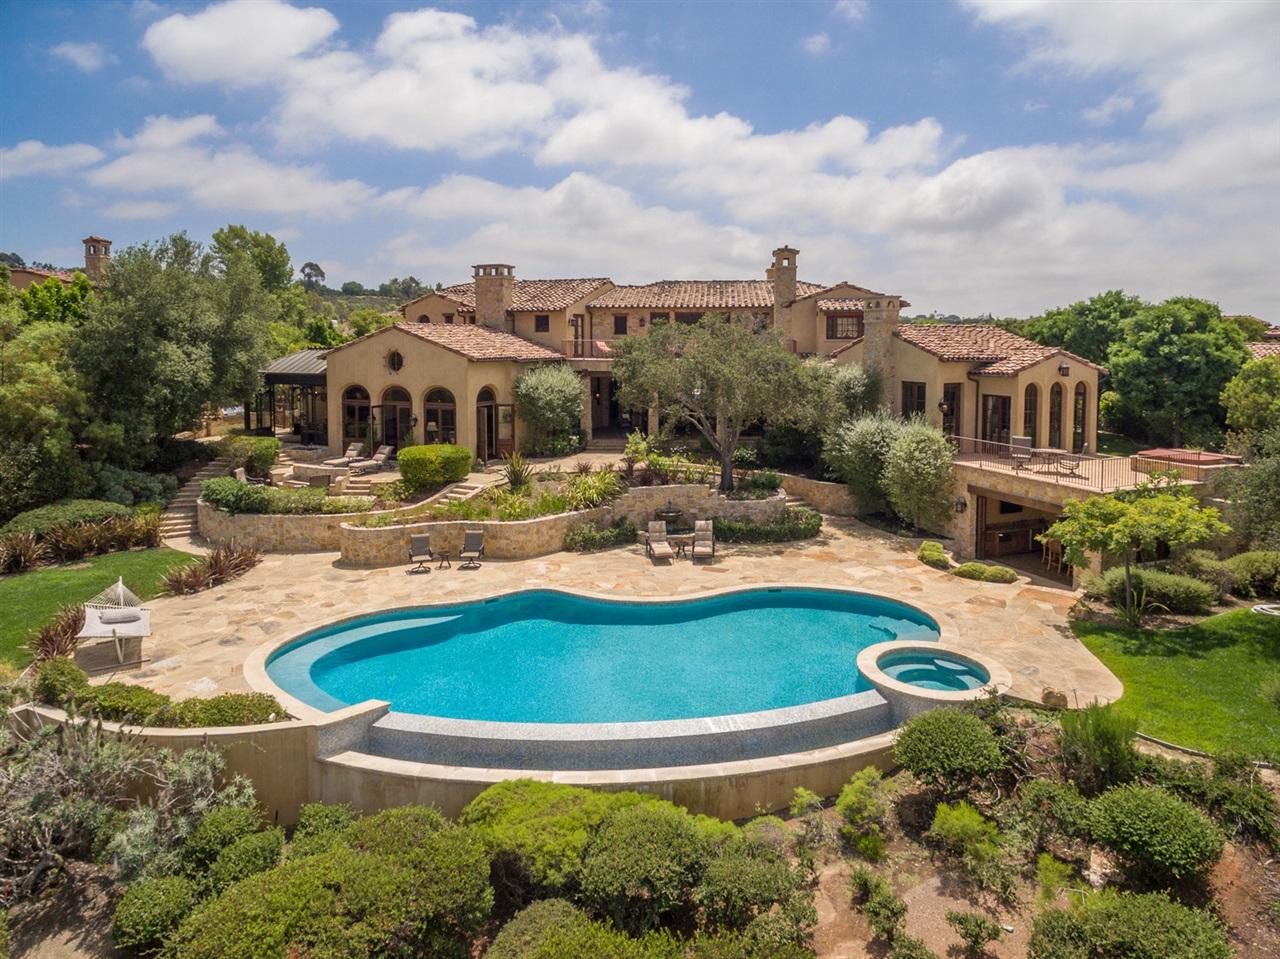 18483 Calle Tramonto, Rancho Santa Fe, CA 92091